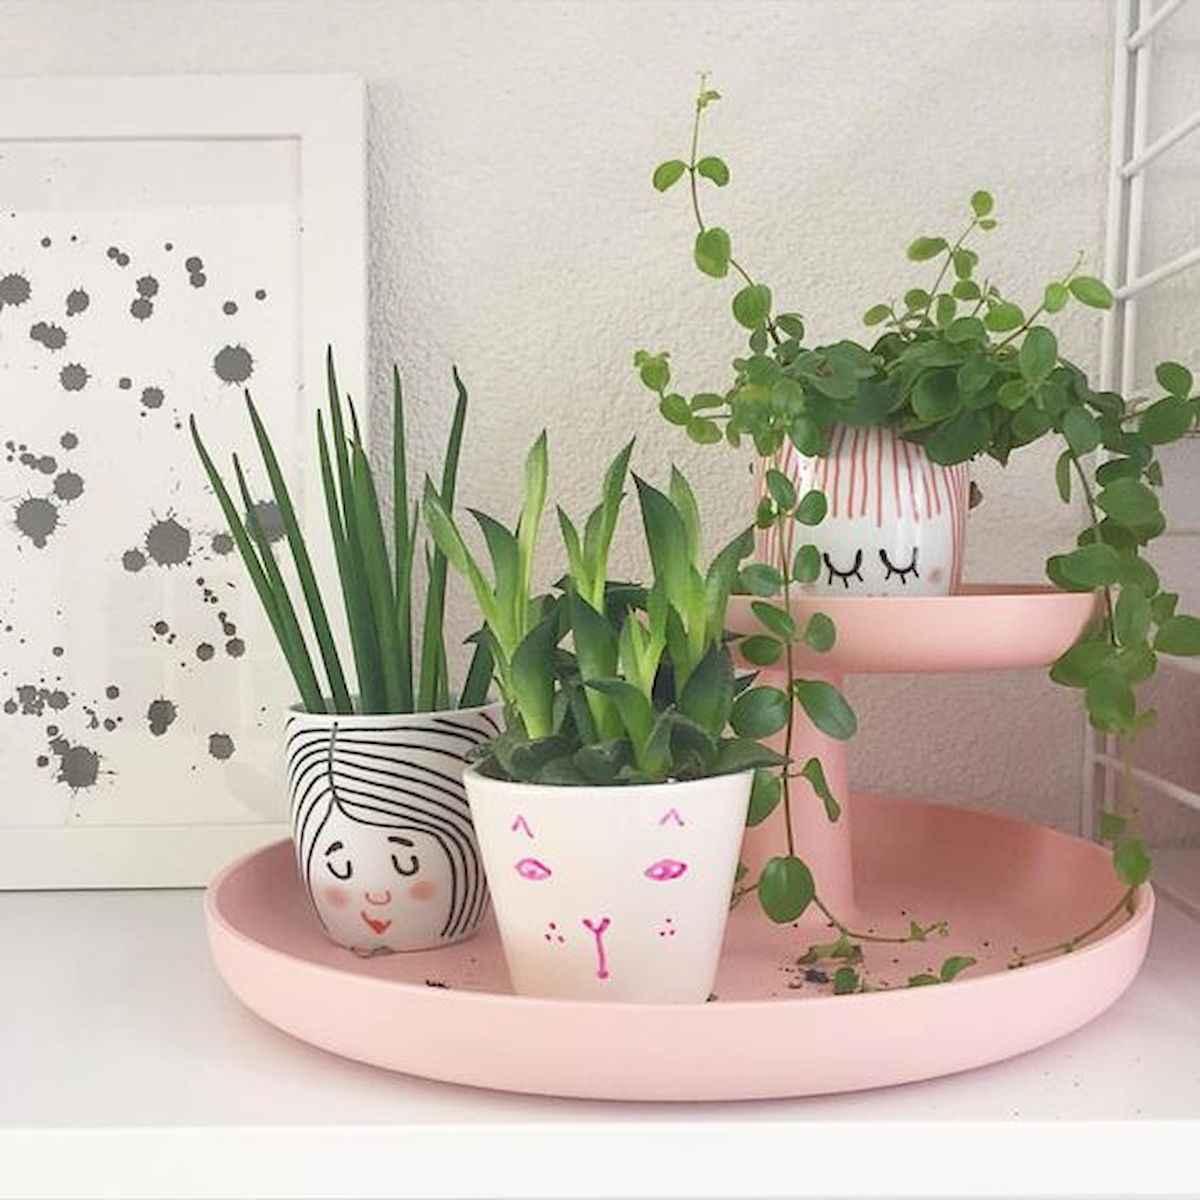 Beautiful Container Gardening Ideas: 100 Beautiful DIY Pots And Container Gardening Ideas (6